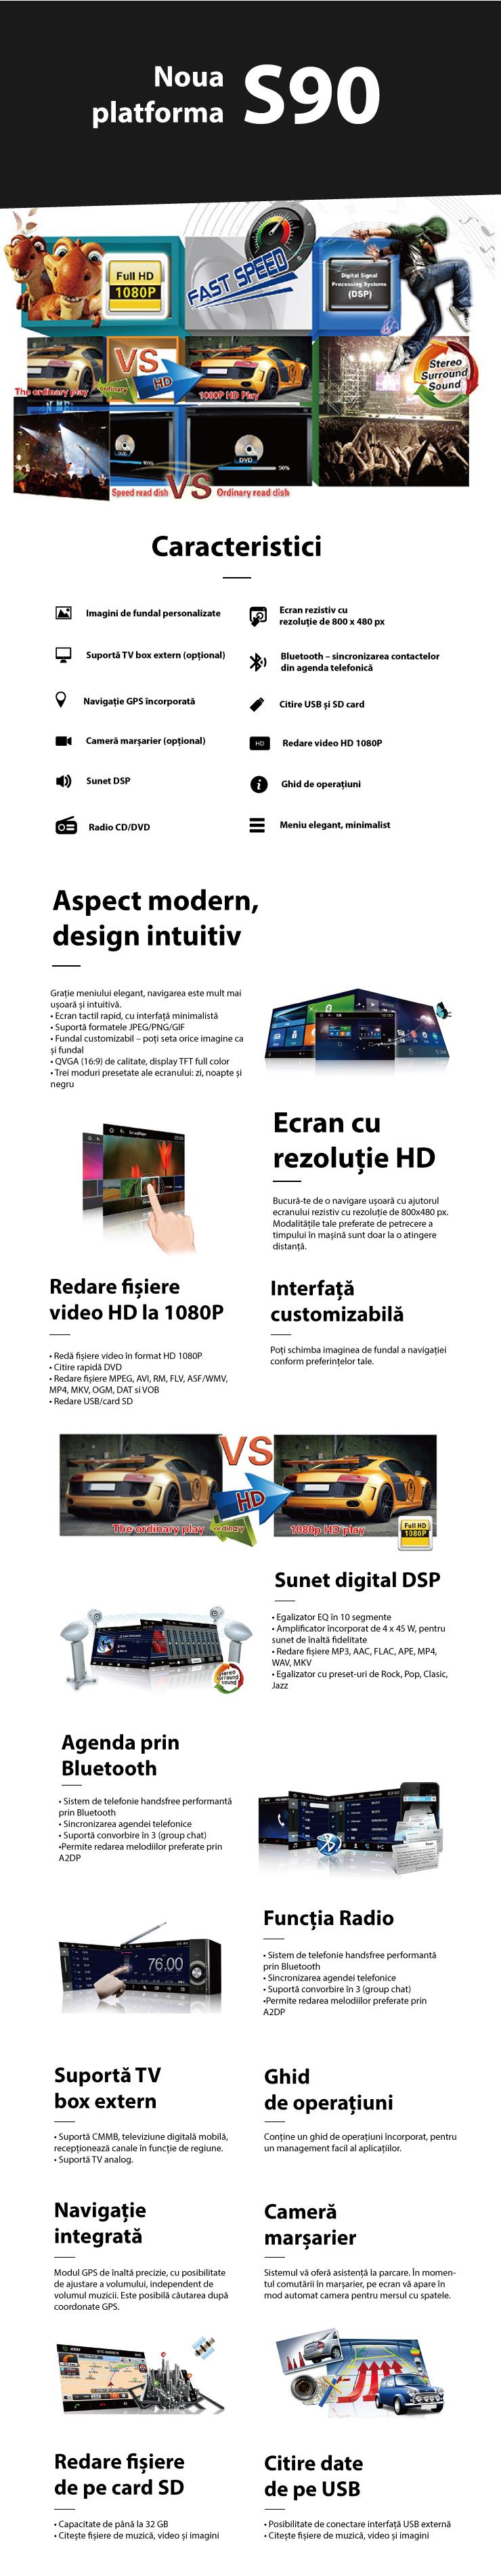 edotec platforma s90